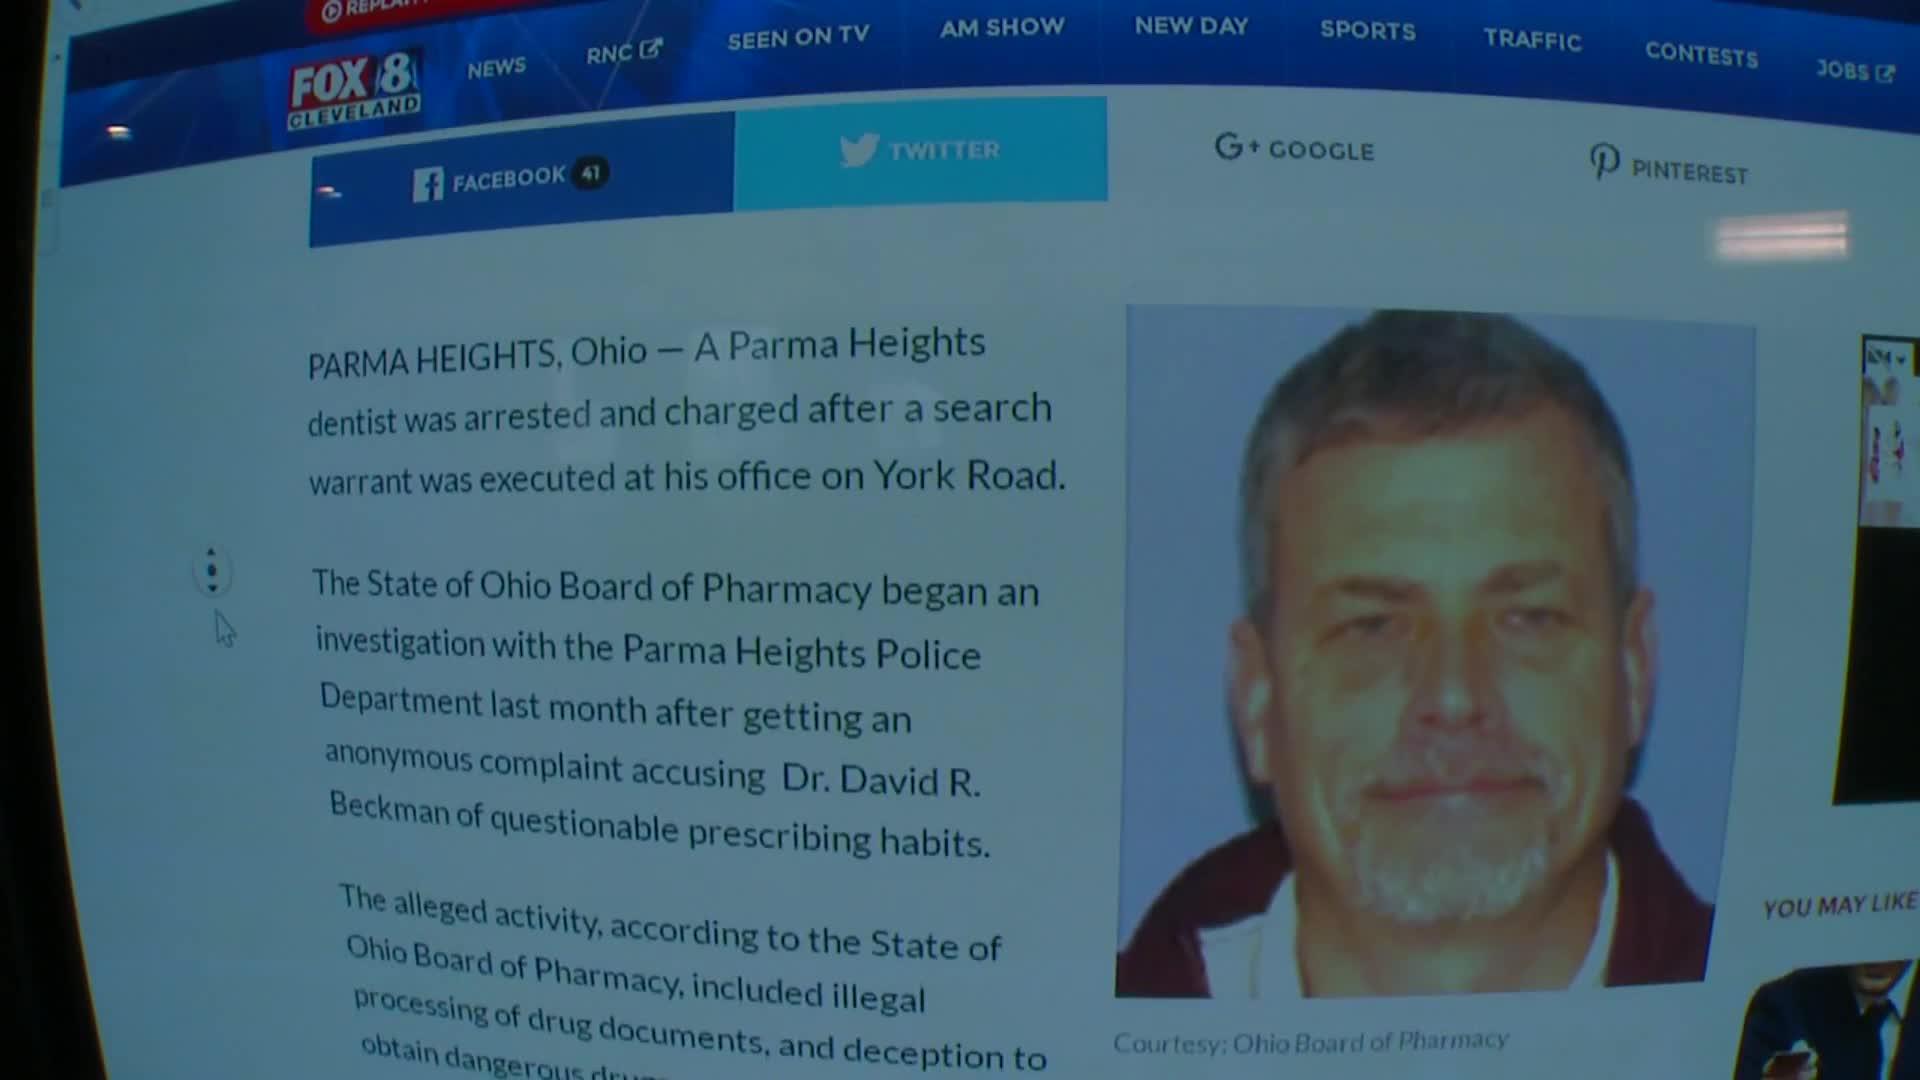 Dentist Accused of Questionable Prescribing Habits Arrested